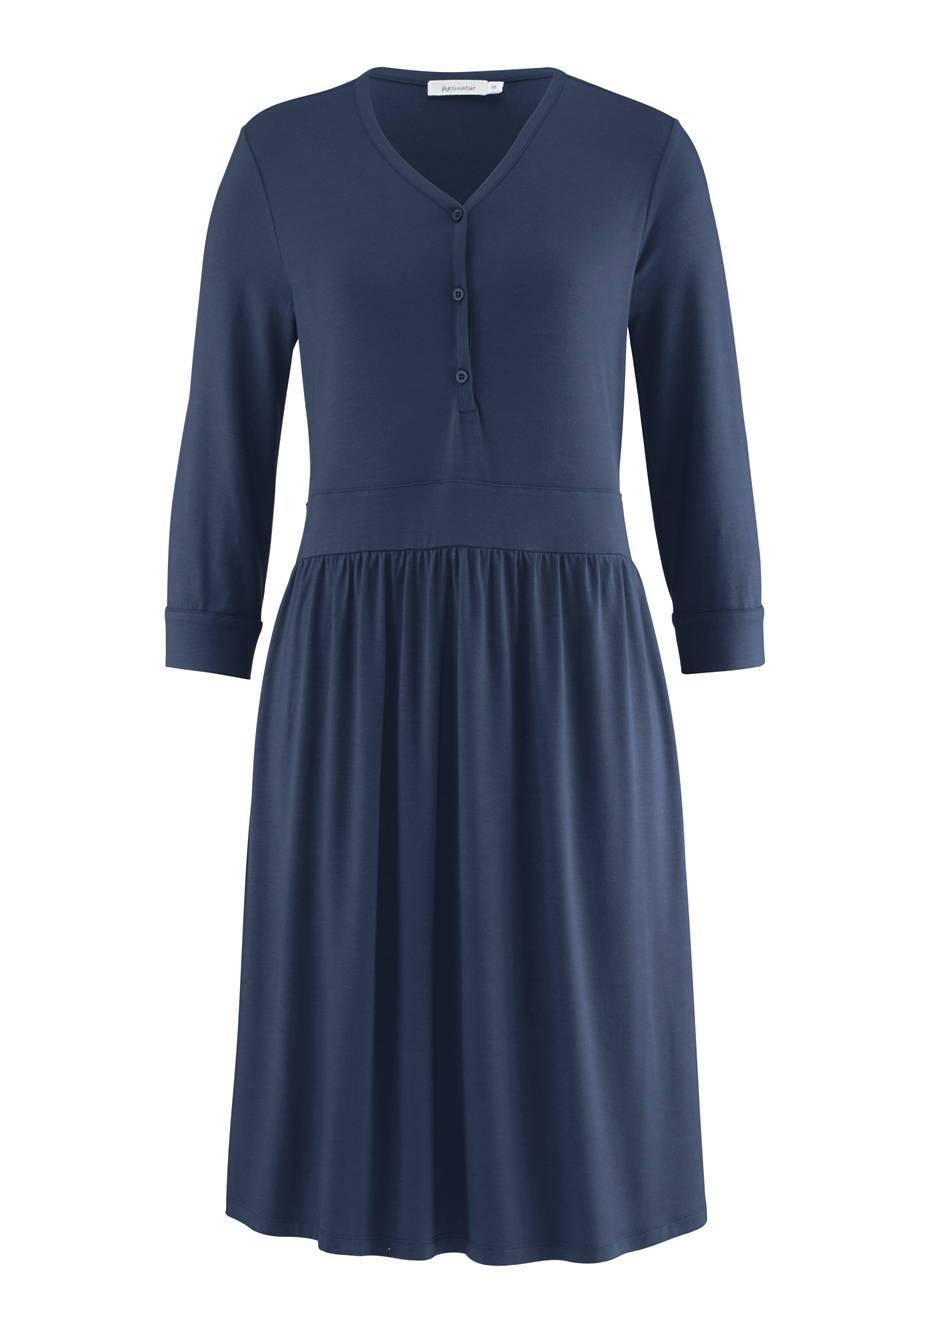 Dress made from TENCEL ™ Modal